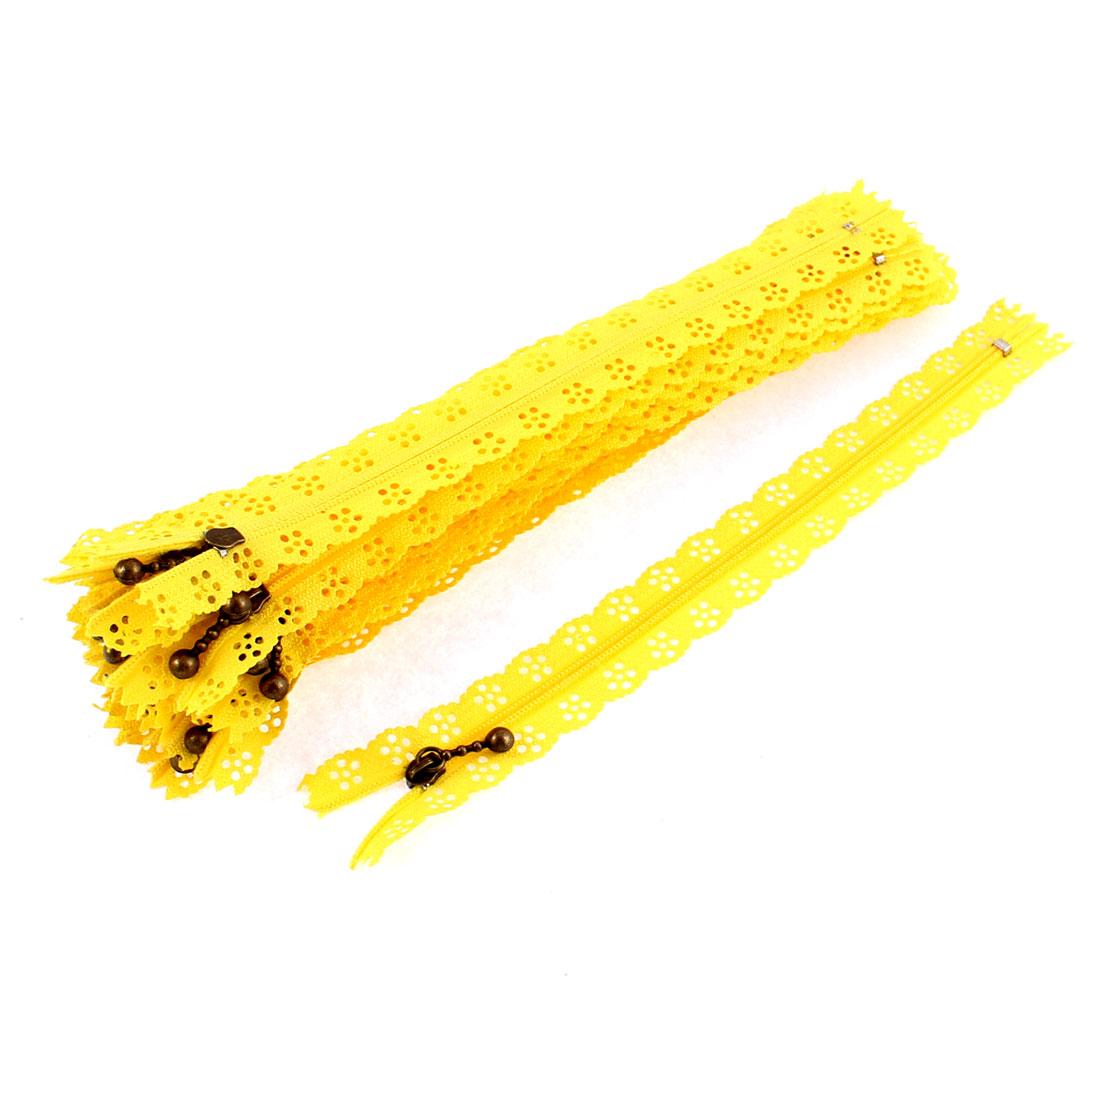 Nylon Coil Zippers Lace Edge Tailor Bag Clothing DIY Craft Yellow 20cm 20 Pcs